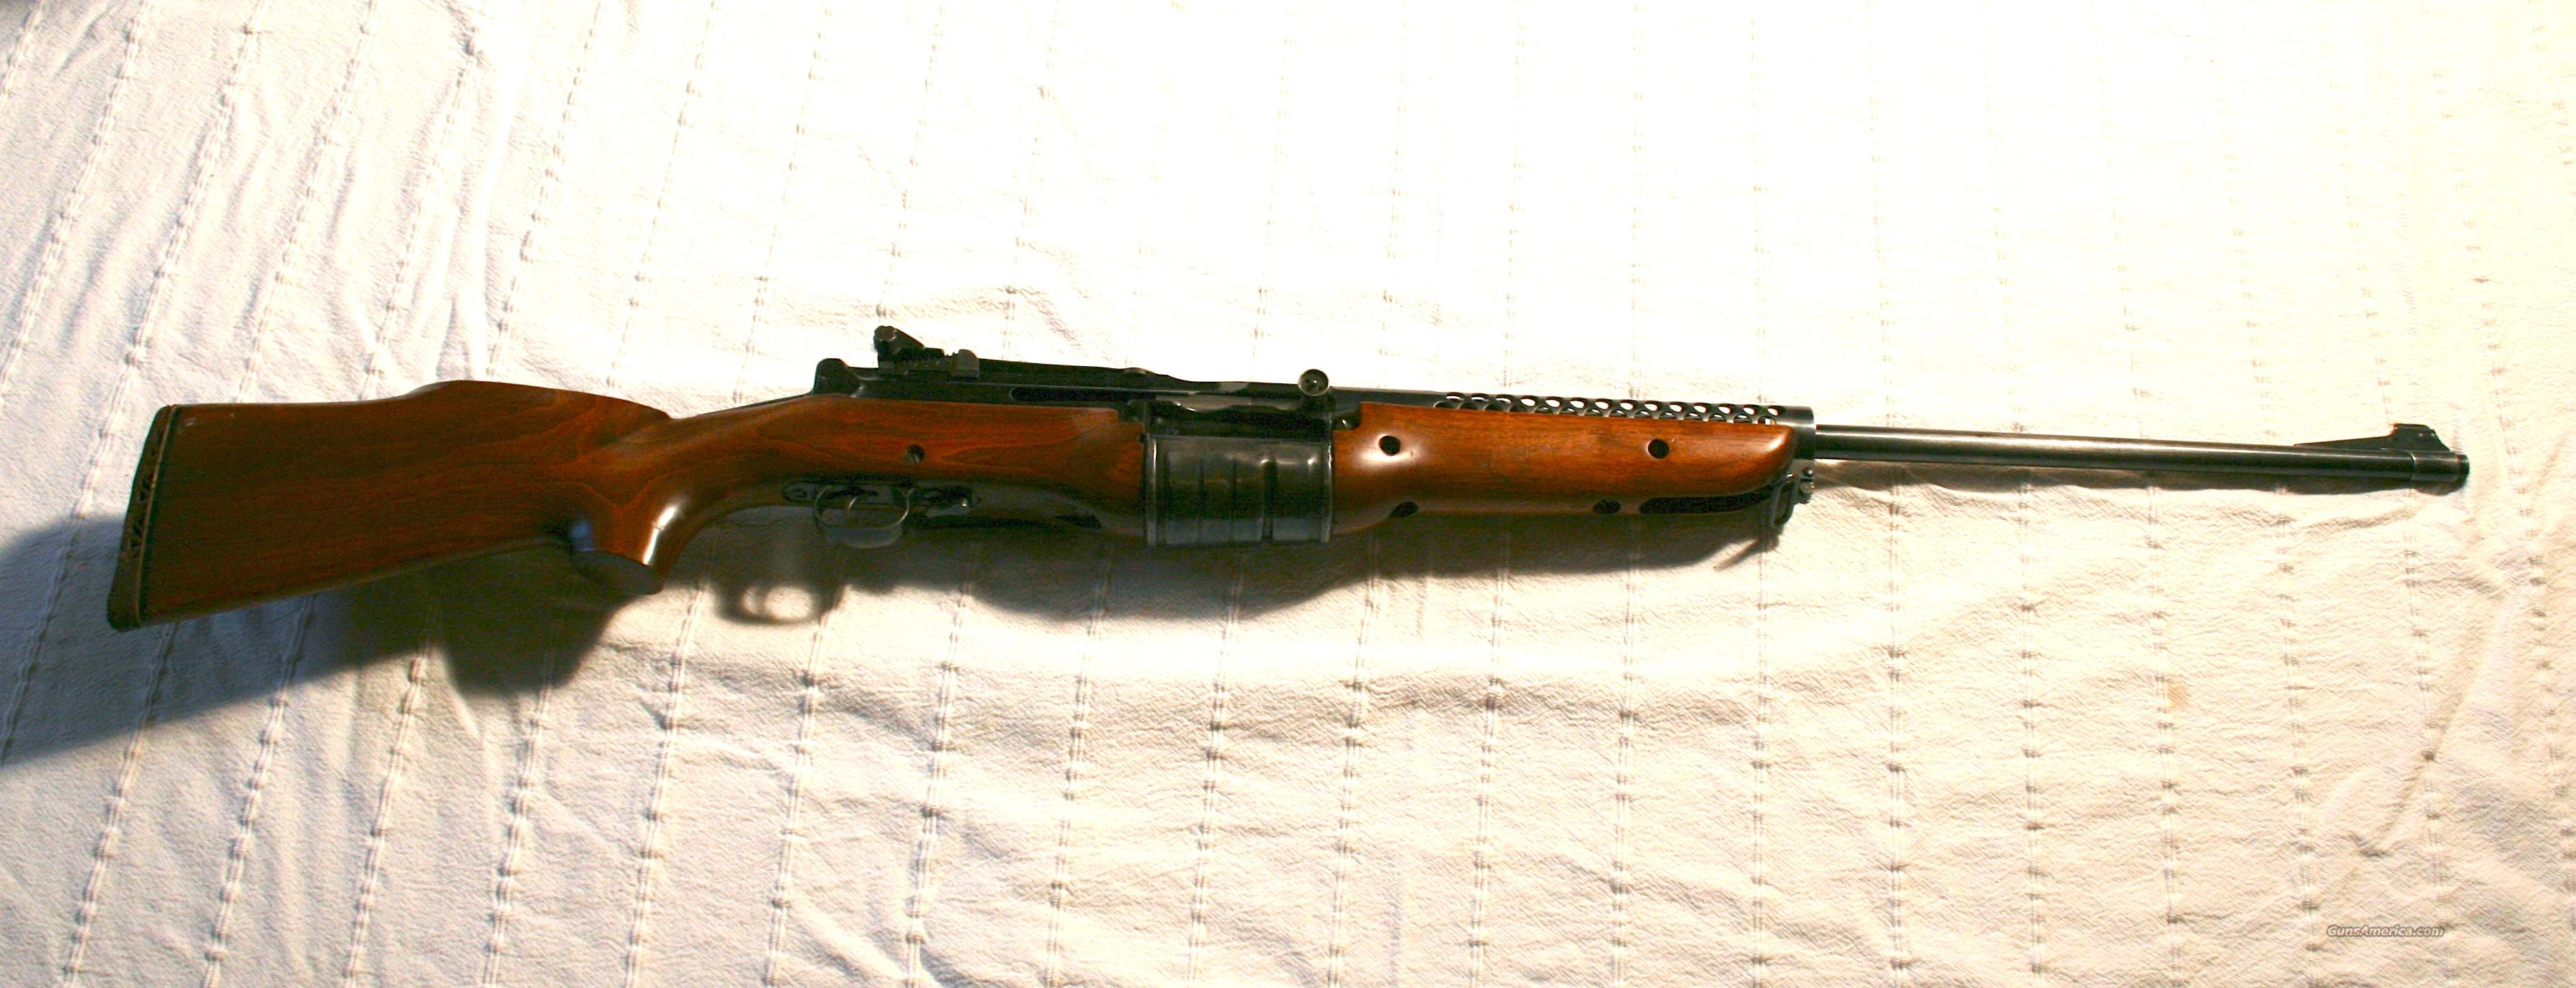 1941 Johnson For Sale >> Johnson 1941 Rifle Model 41 Semi Automatic Rifl For Sale